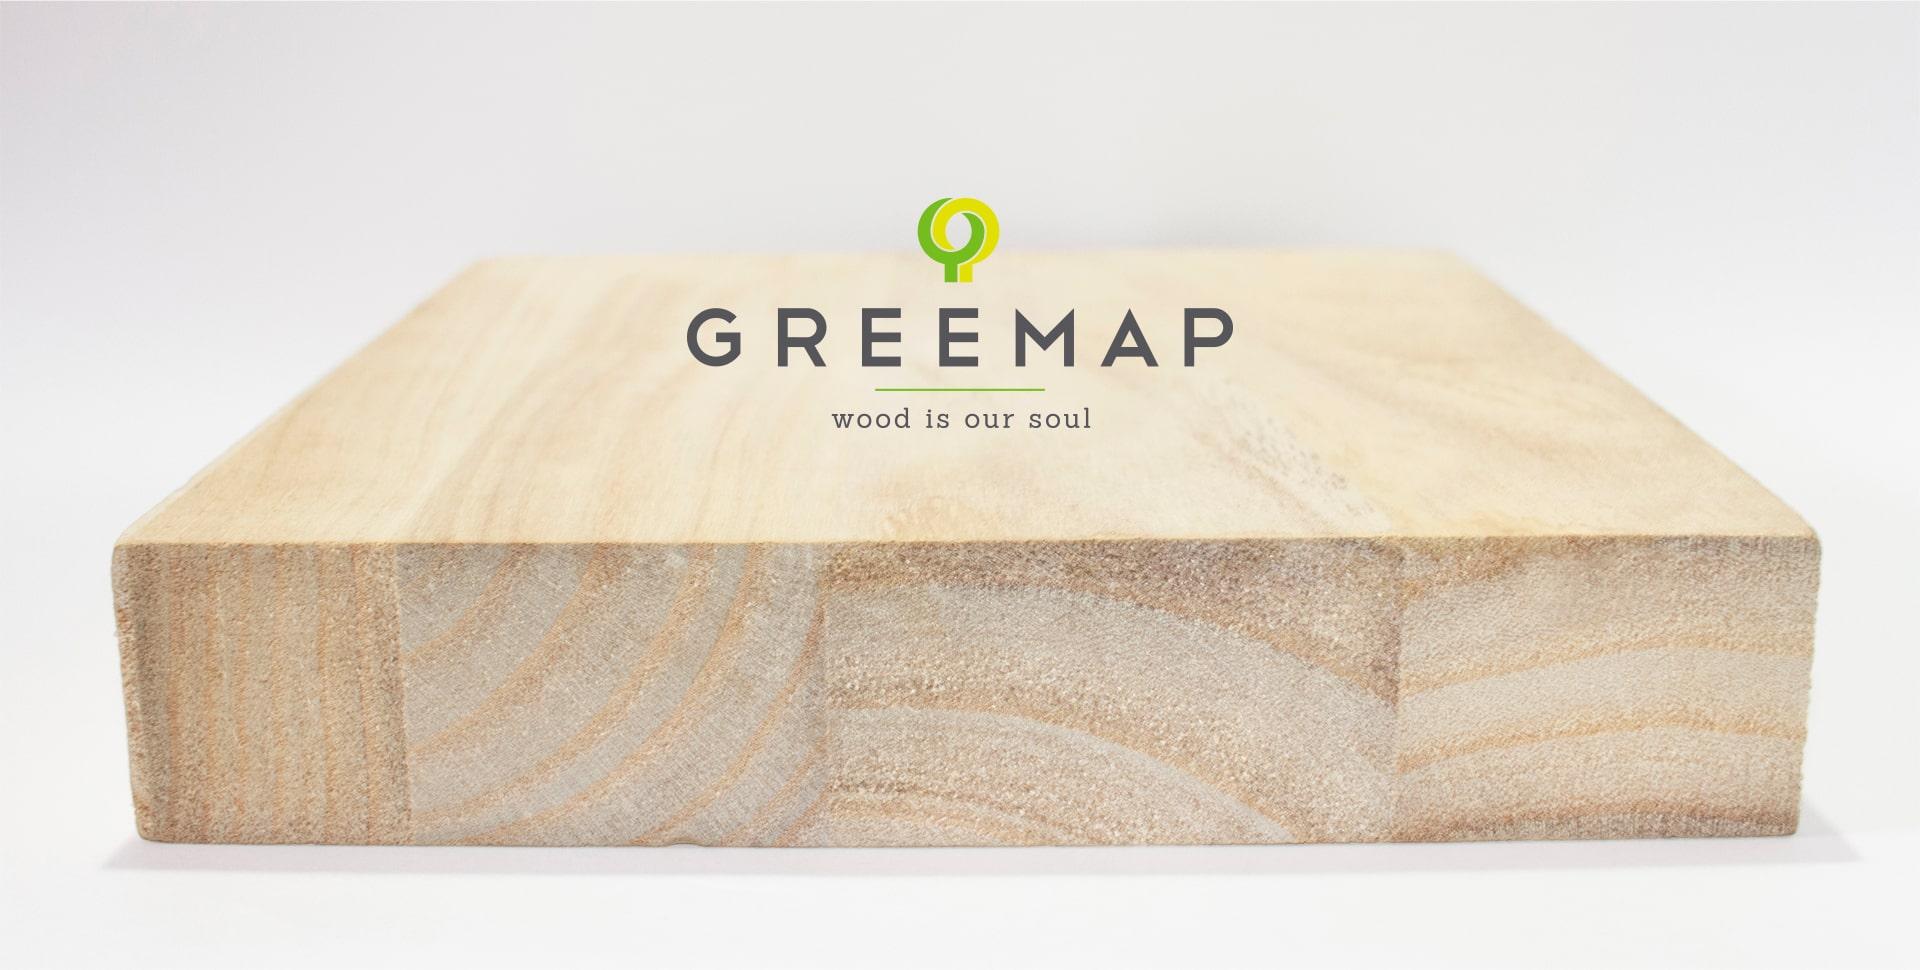 Distribuidor de madera de paulownia